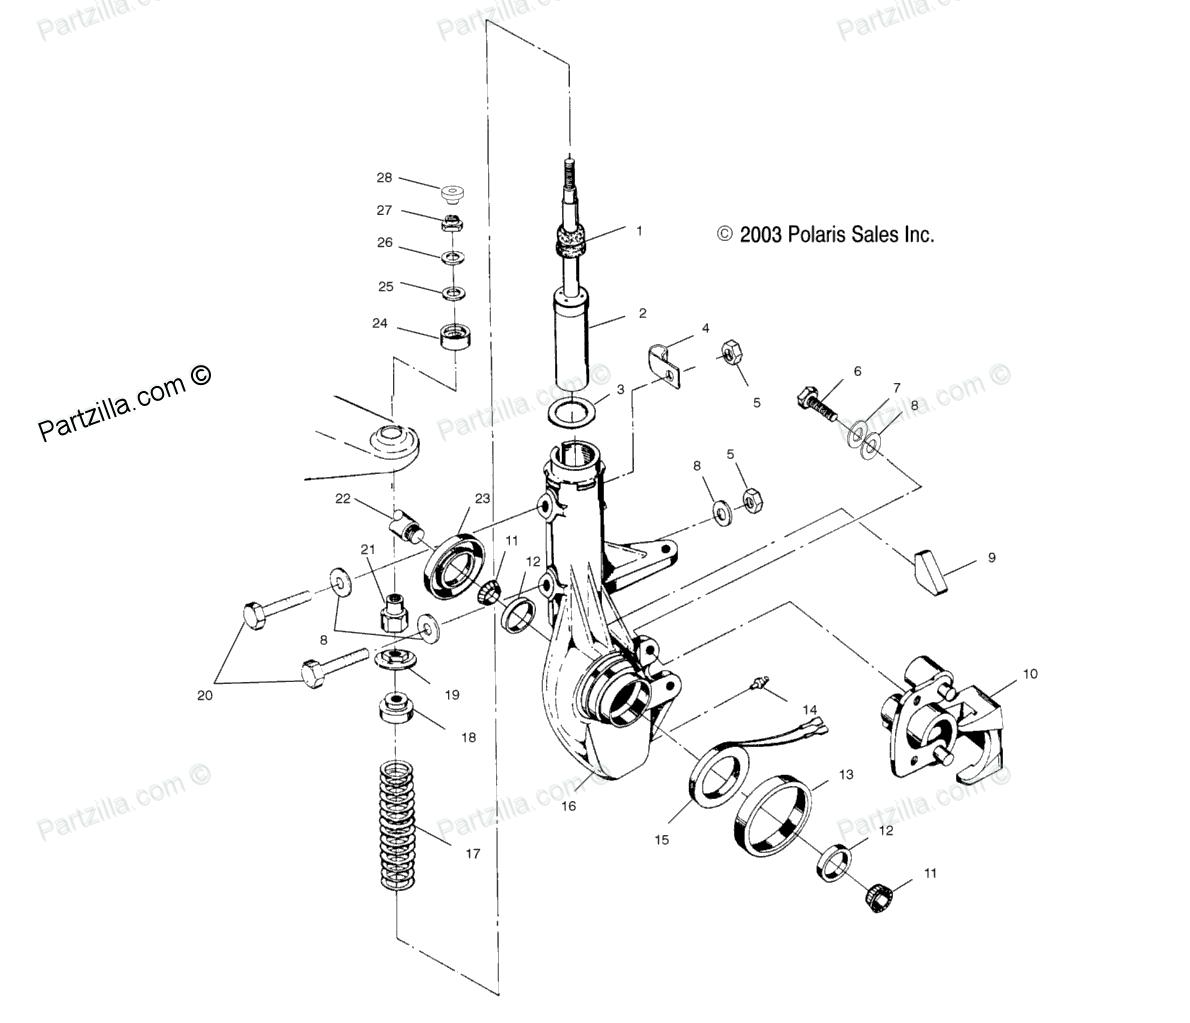 Polaris Sportsman 500 Ho Awd Wiring Diagram